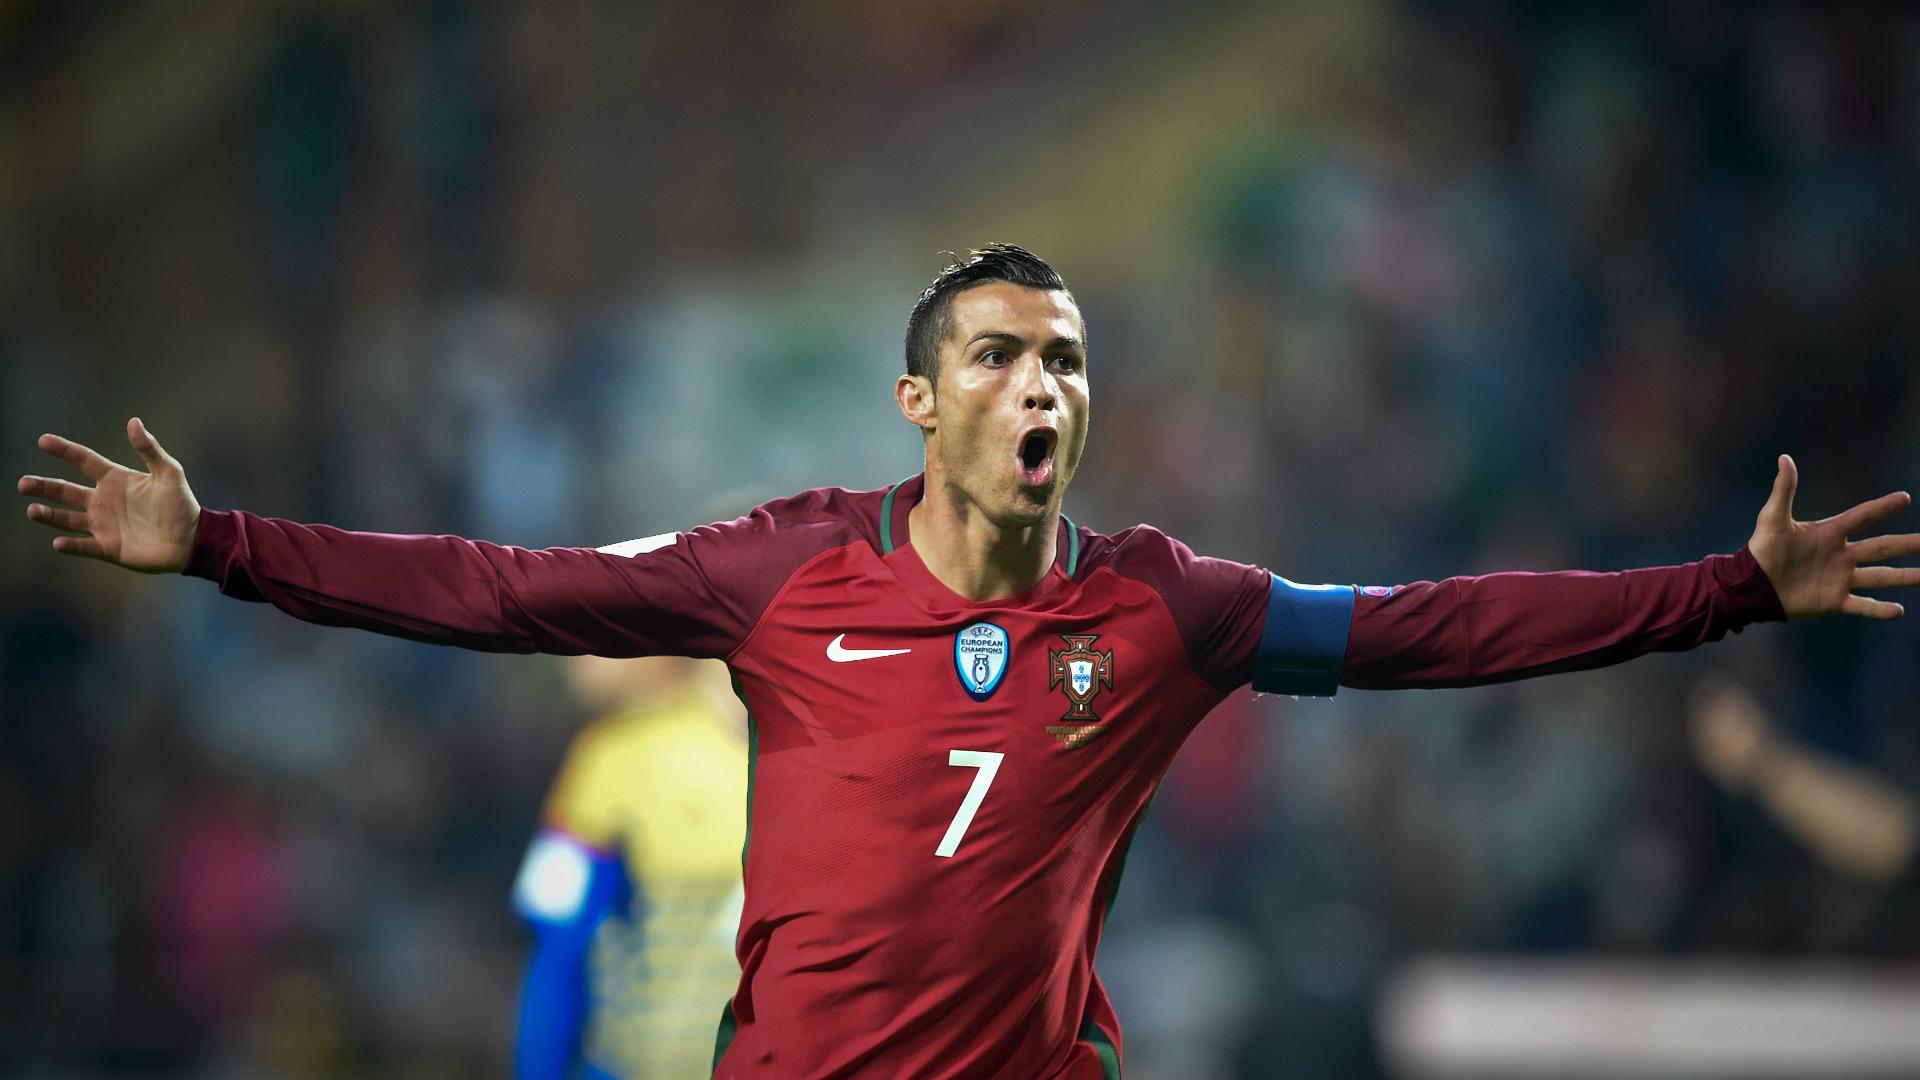 Cristiano Ronaldo faces imprisonment for non-payment of taxes 31.07.2017 41